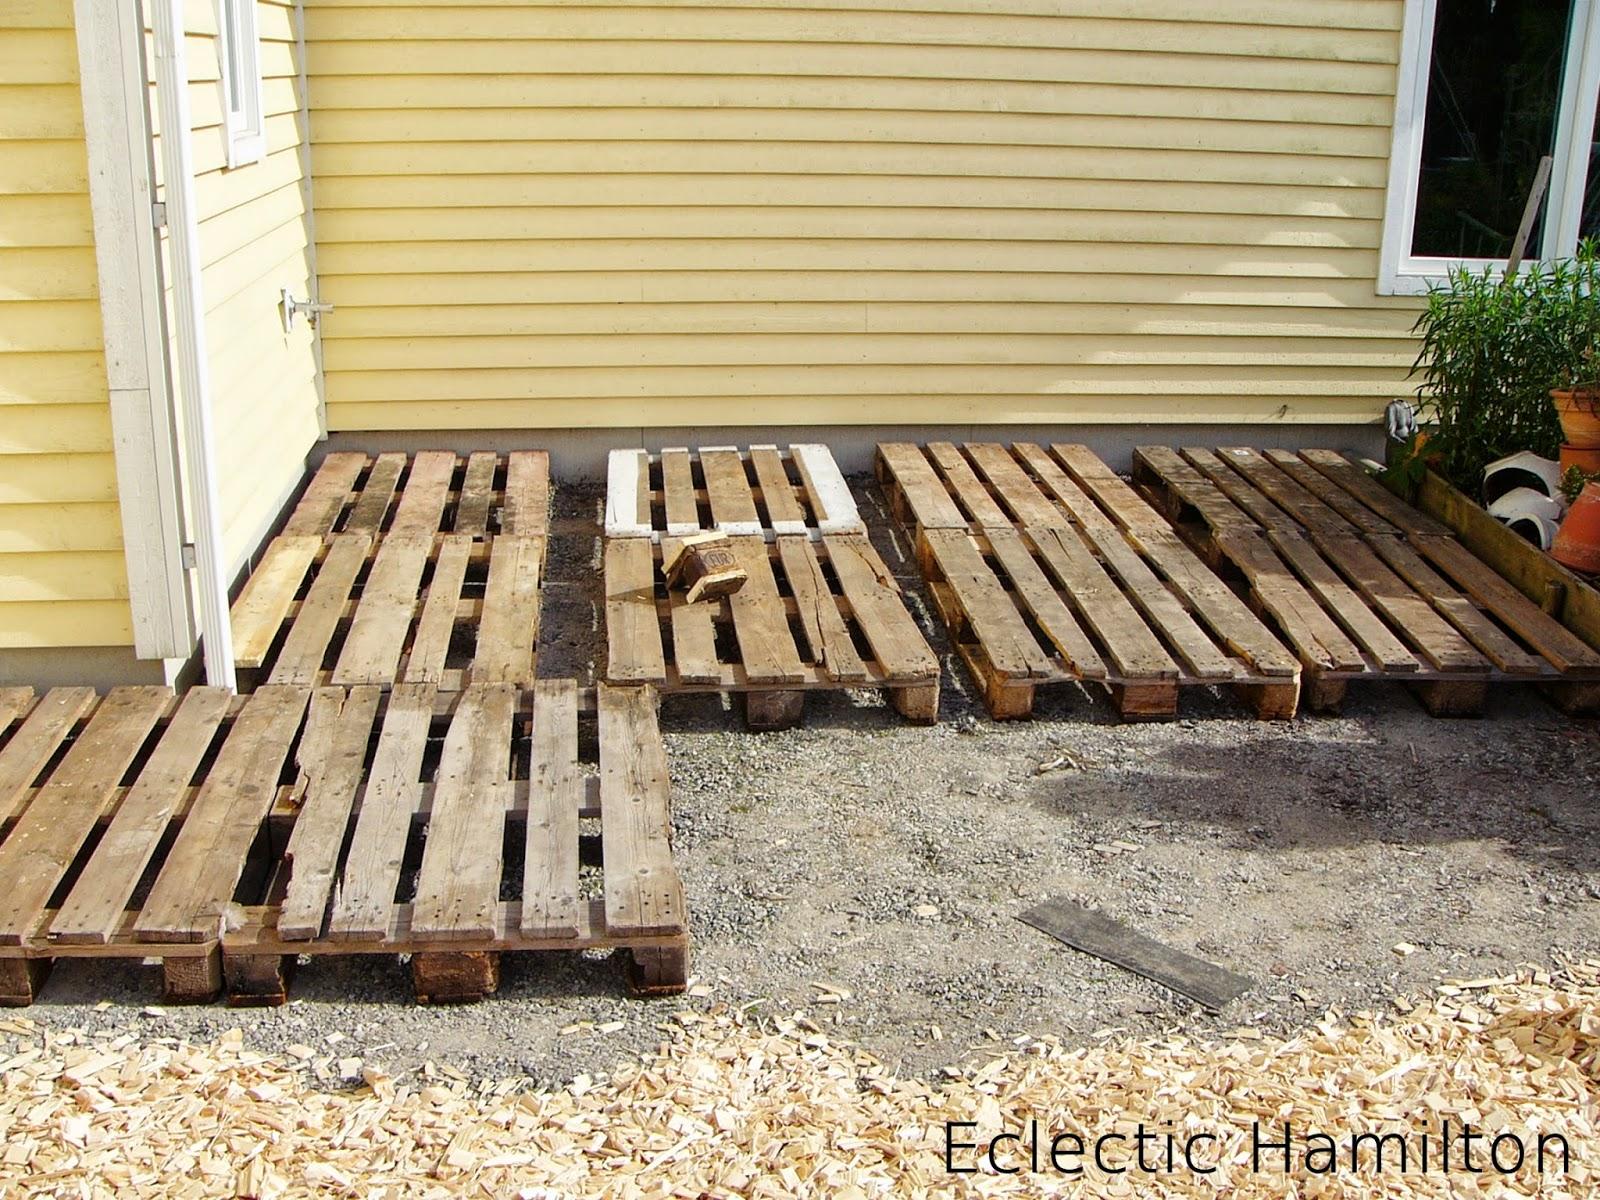 Diy terrasse aus euro paletten vol 1 eclectic hamilton for Europaletten selber bauen